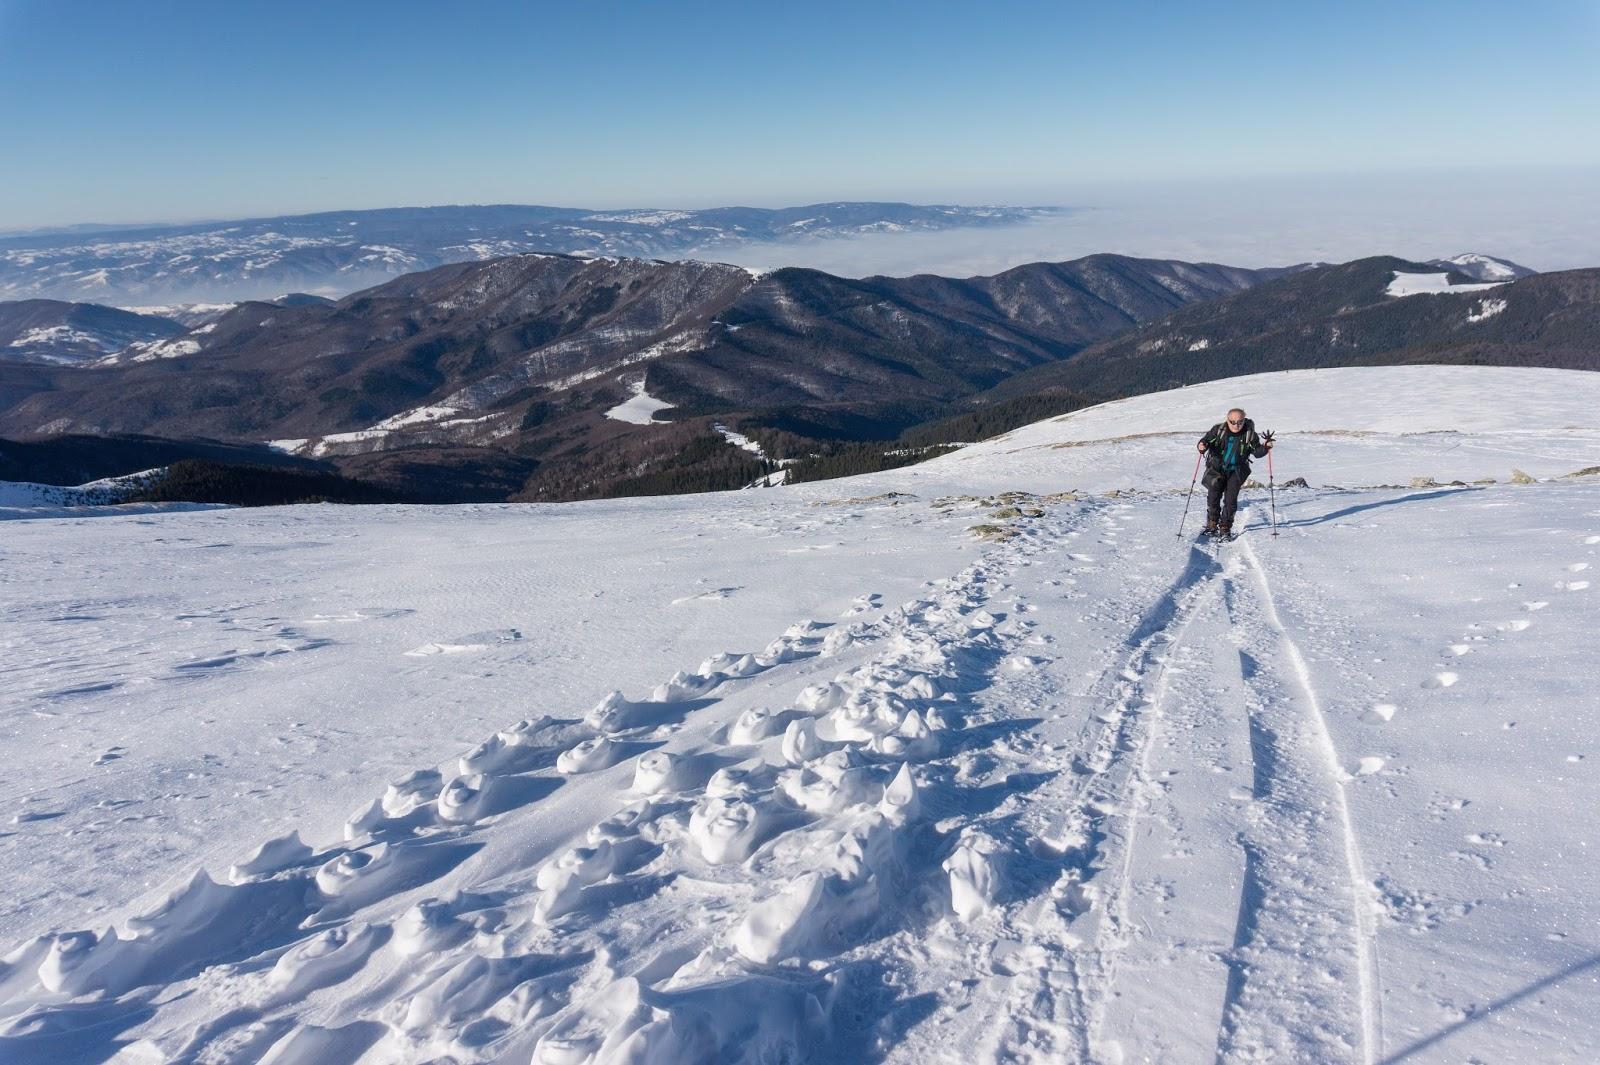 Urcarea spre vârful Sadovanu - Alina Cirja